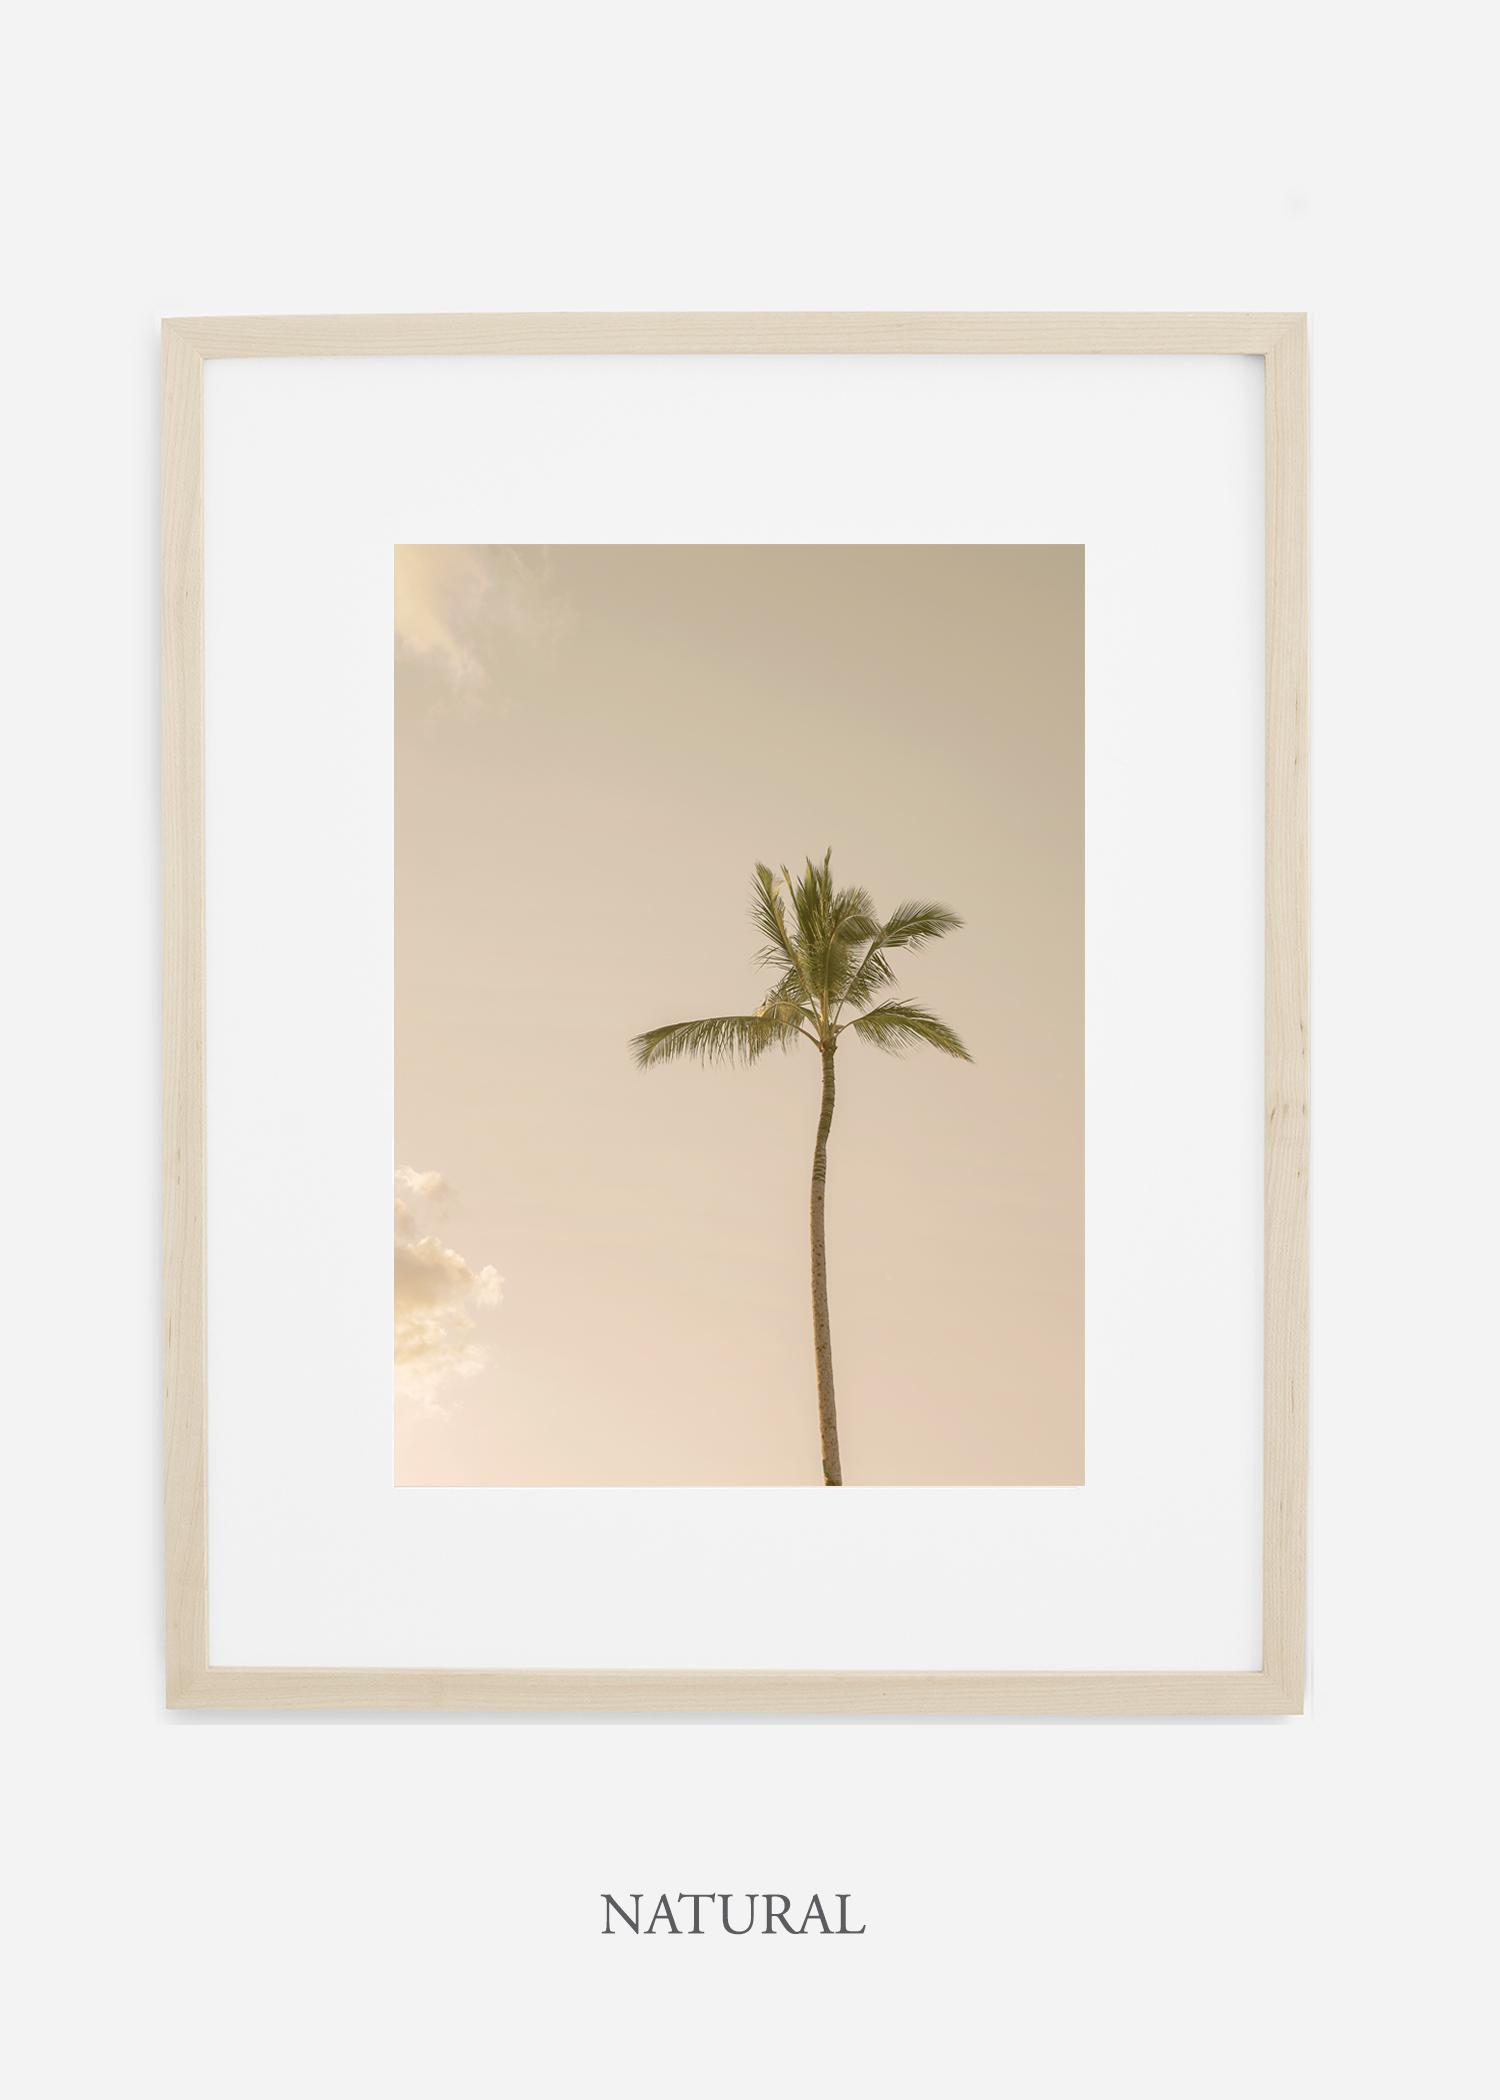 WilderCalifornia_Hawaii_lonepalm_tropicalart_naturalframe.jpg